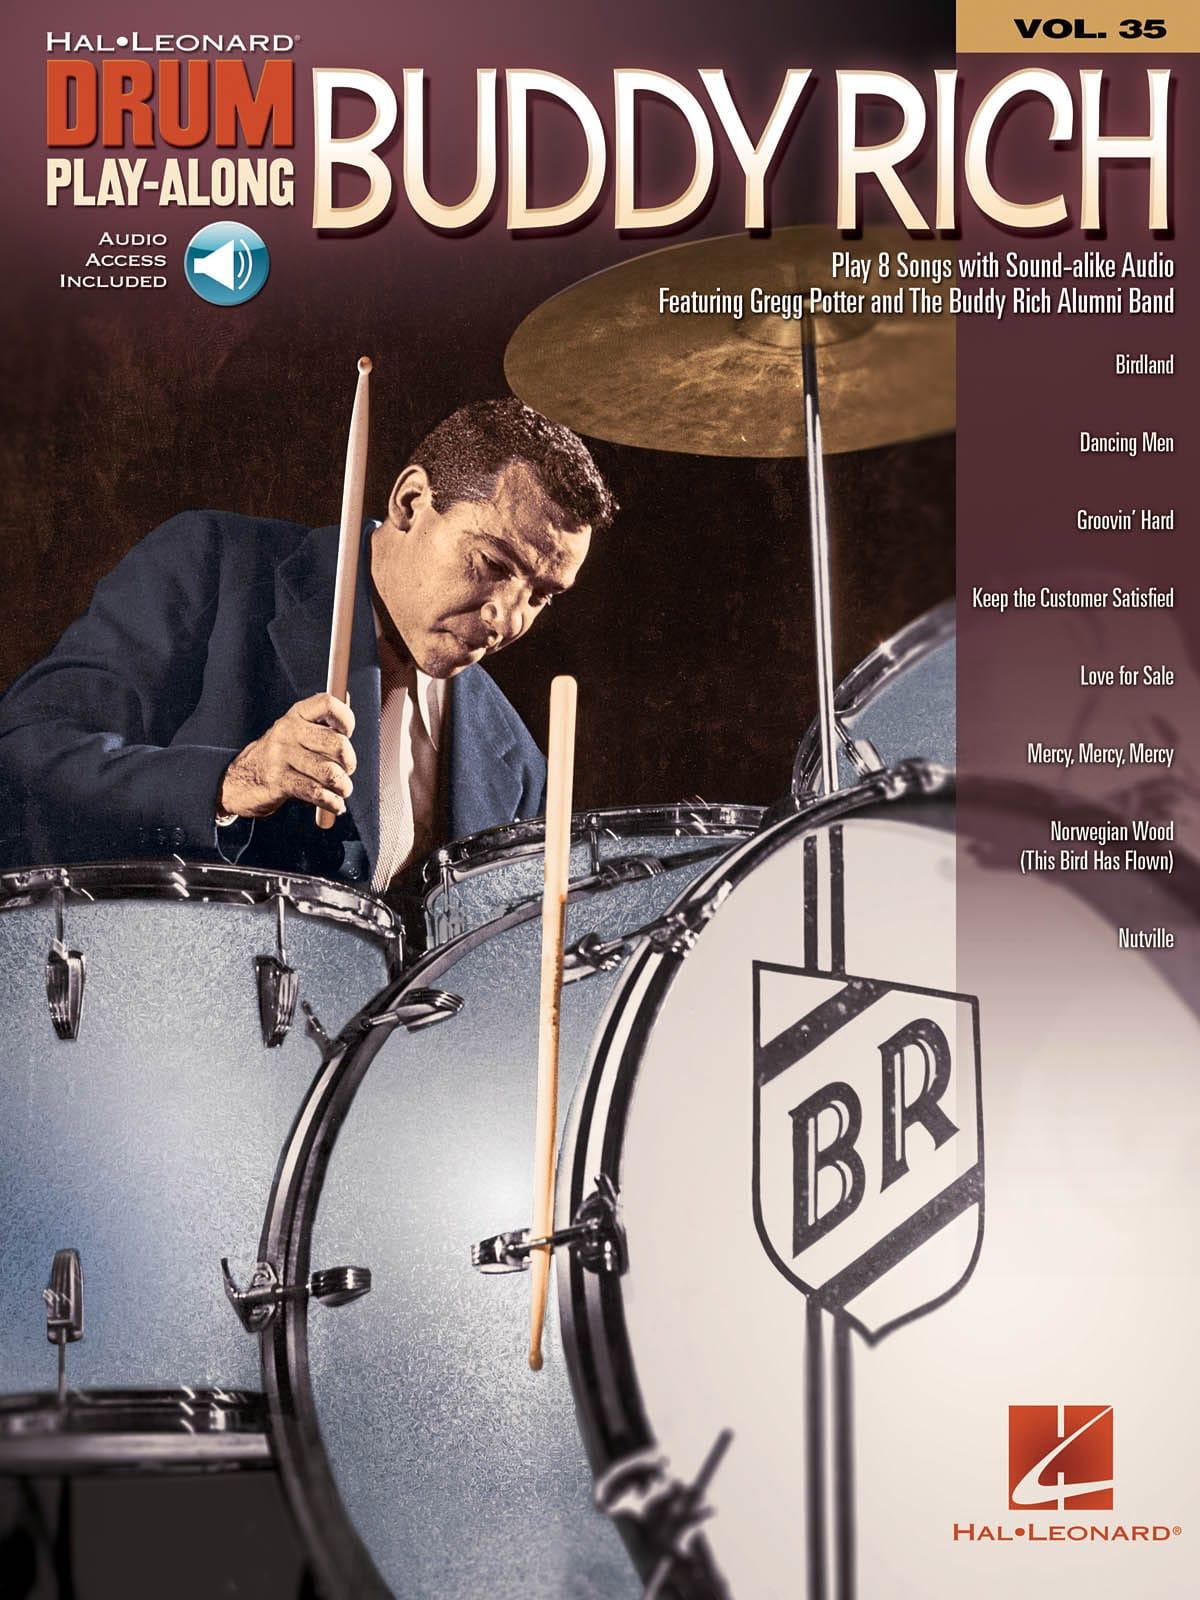 Drum Play-Along Volume 35 Buddy Rich - Buddy Rich - laflutedepan.com